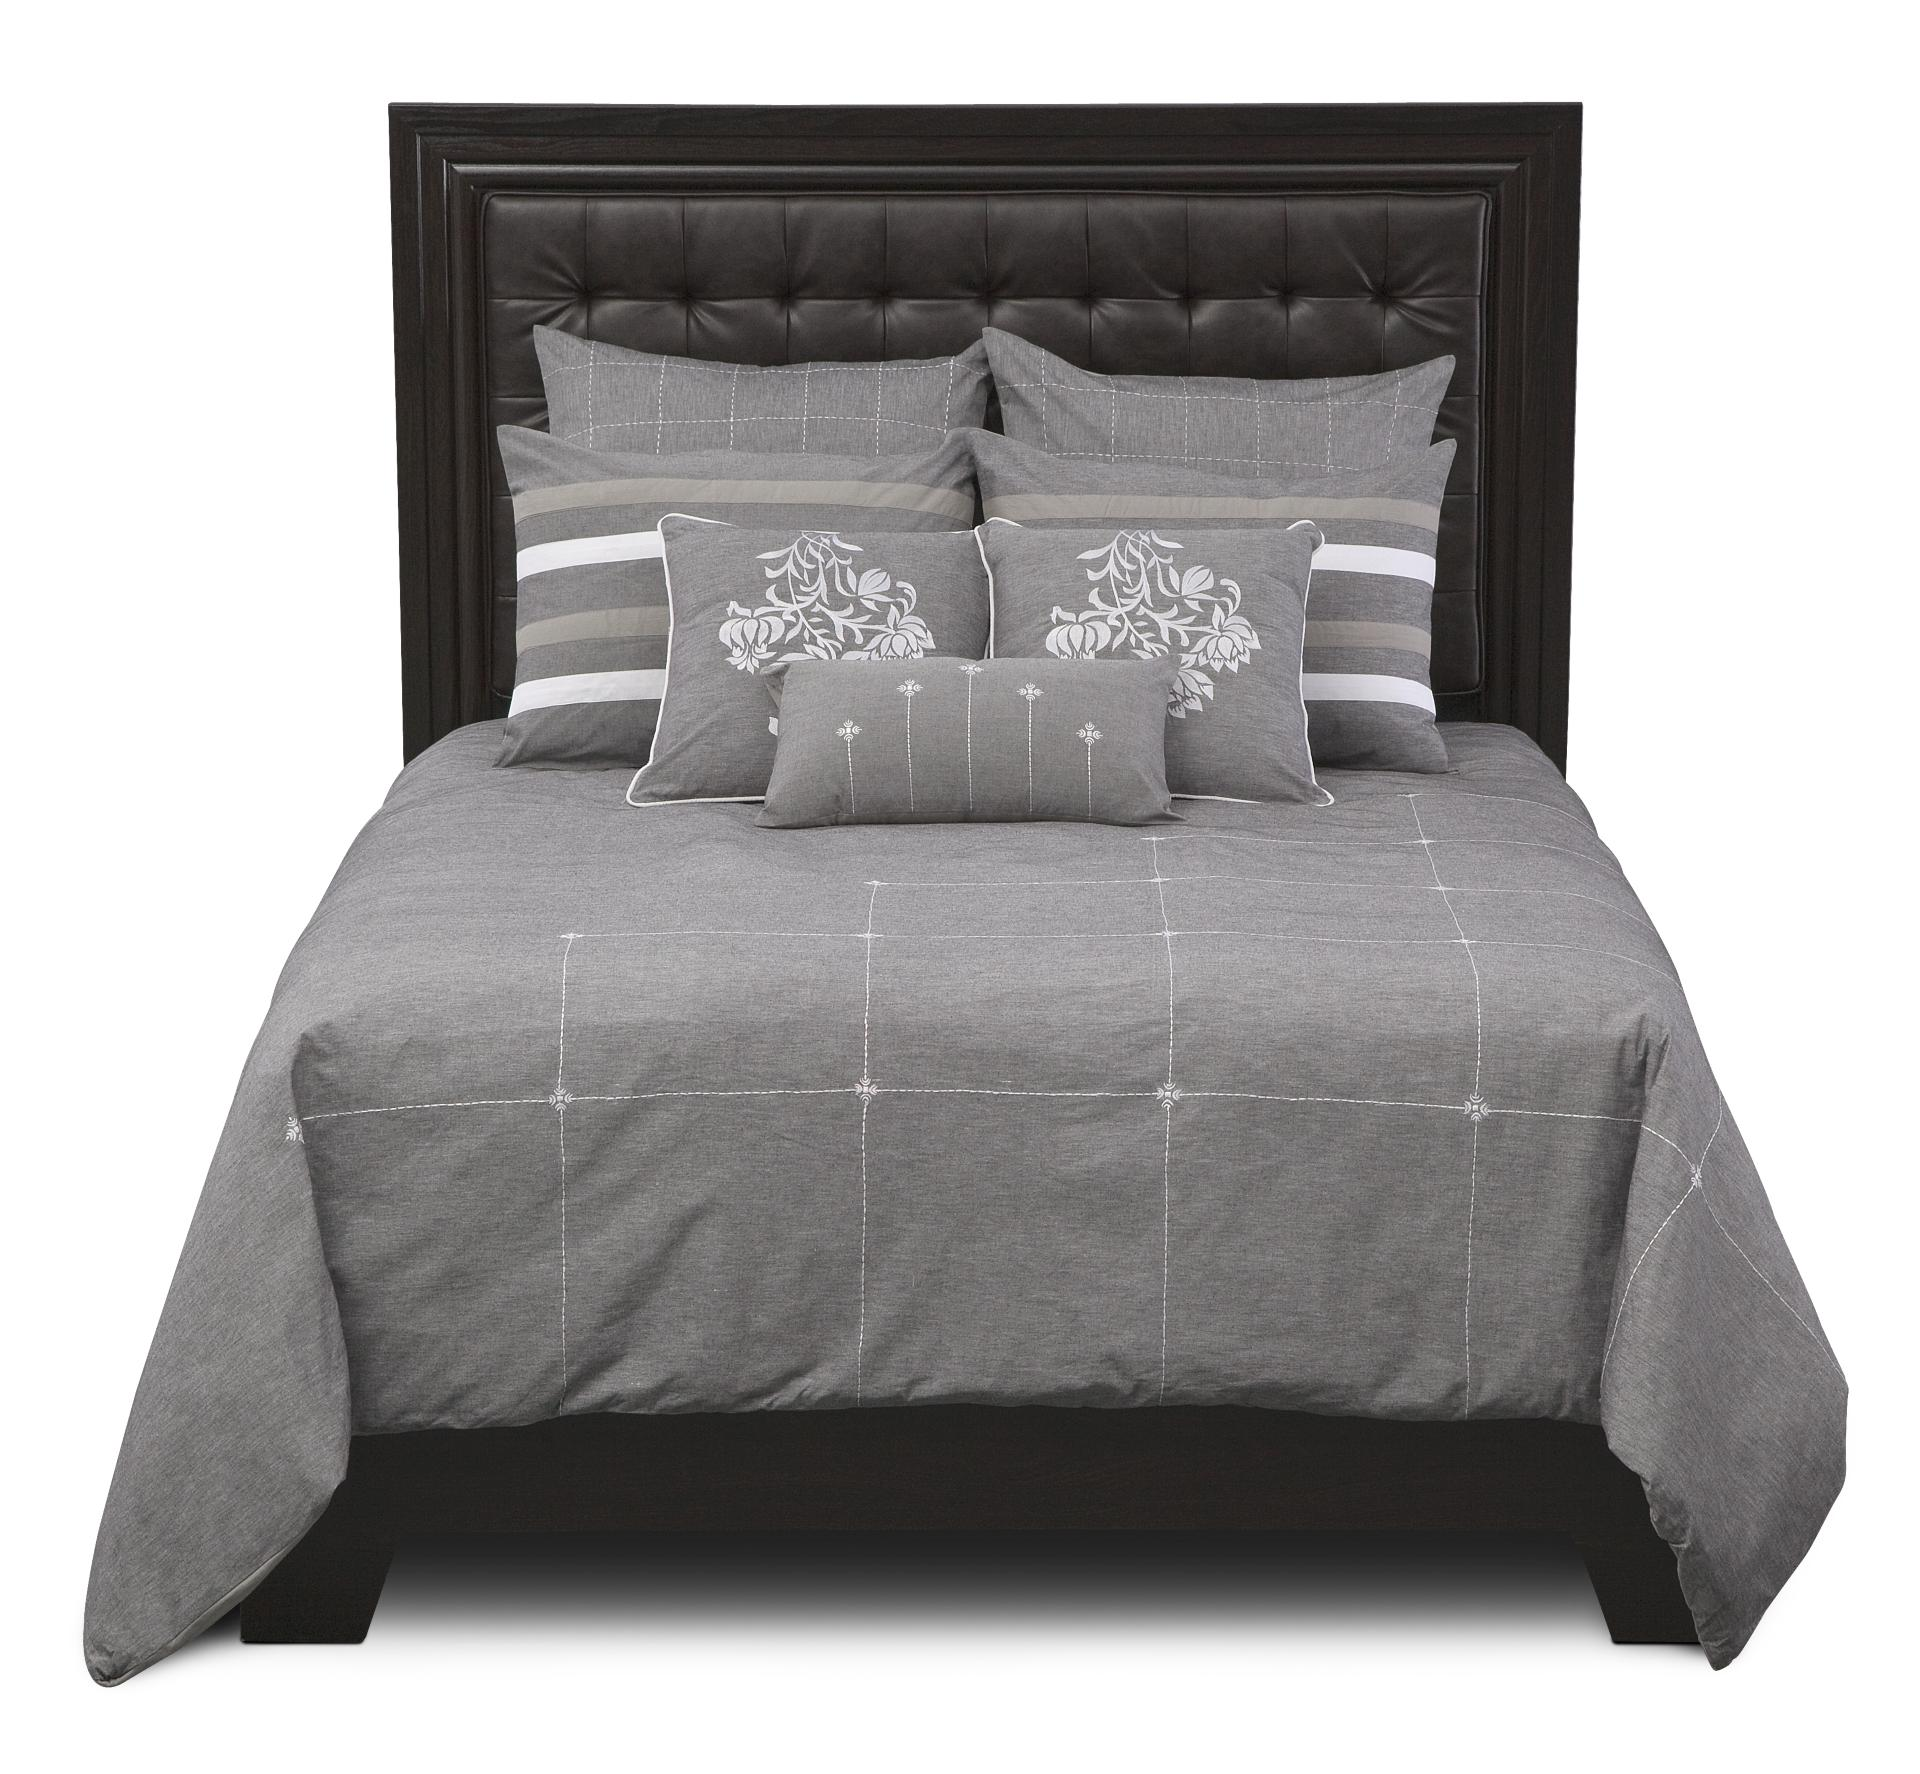 Paris Queen Bedding Set